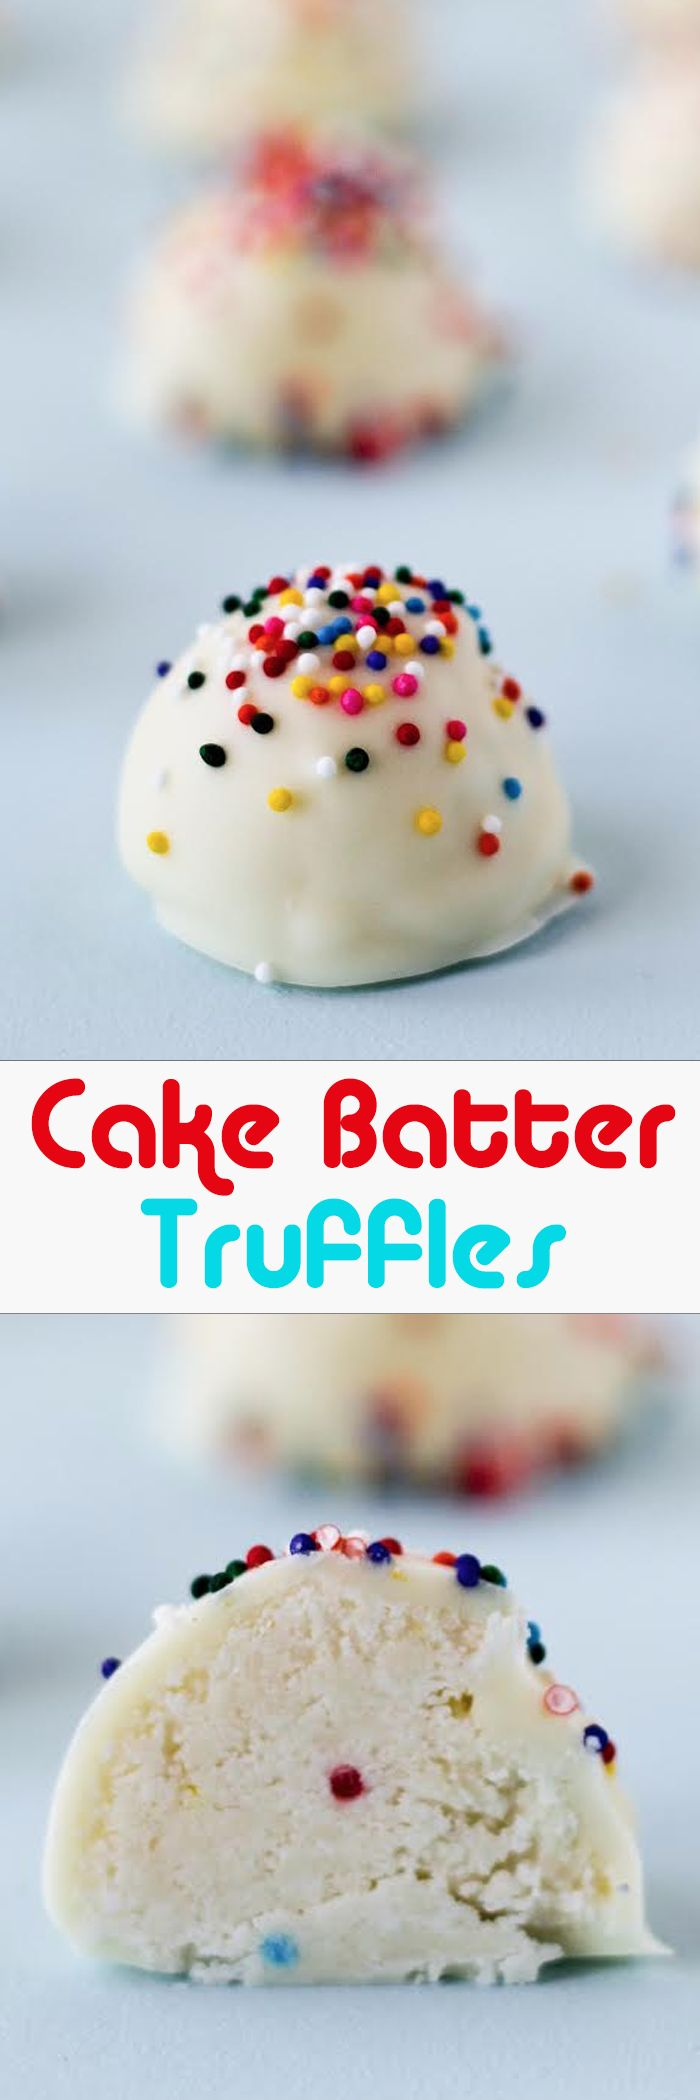 Raw cake batter recipe